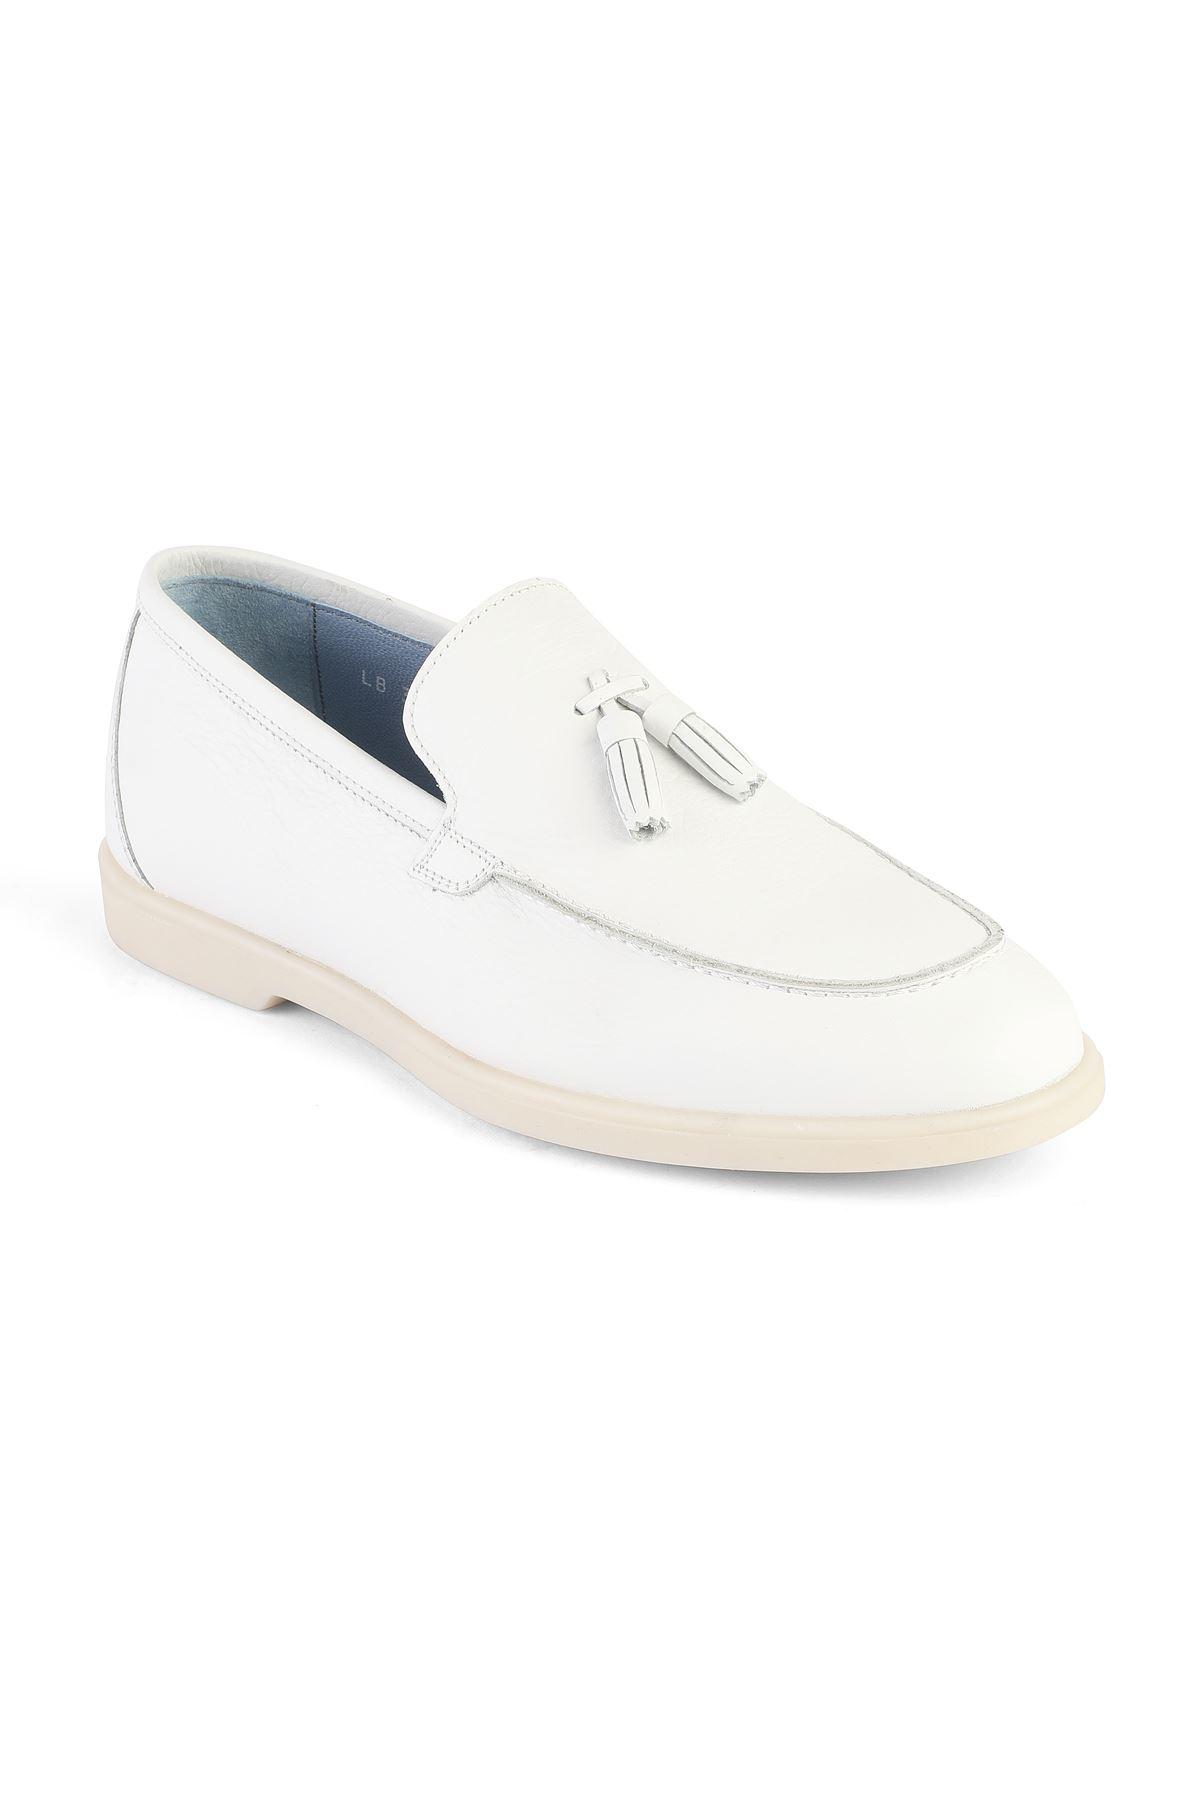 Libero 3219 White Loafer Shoes